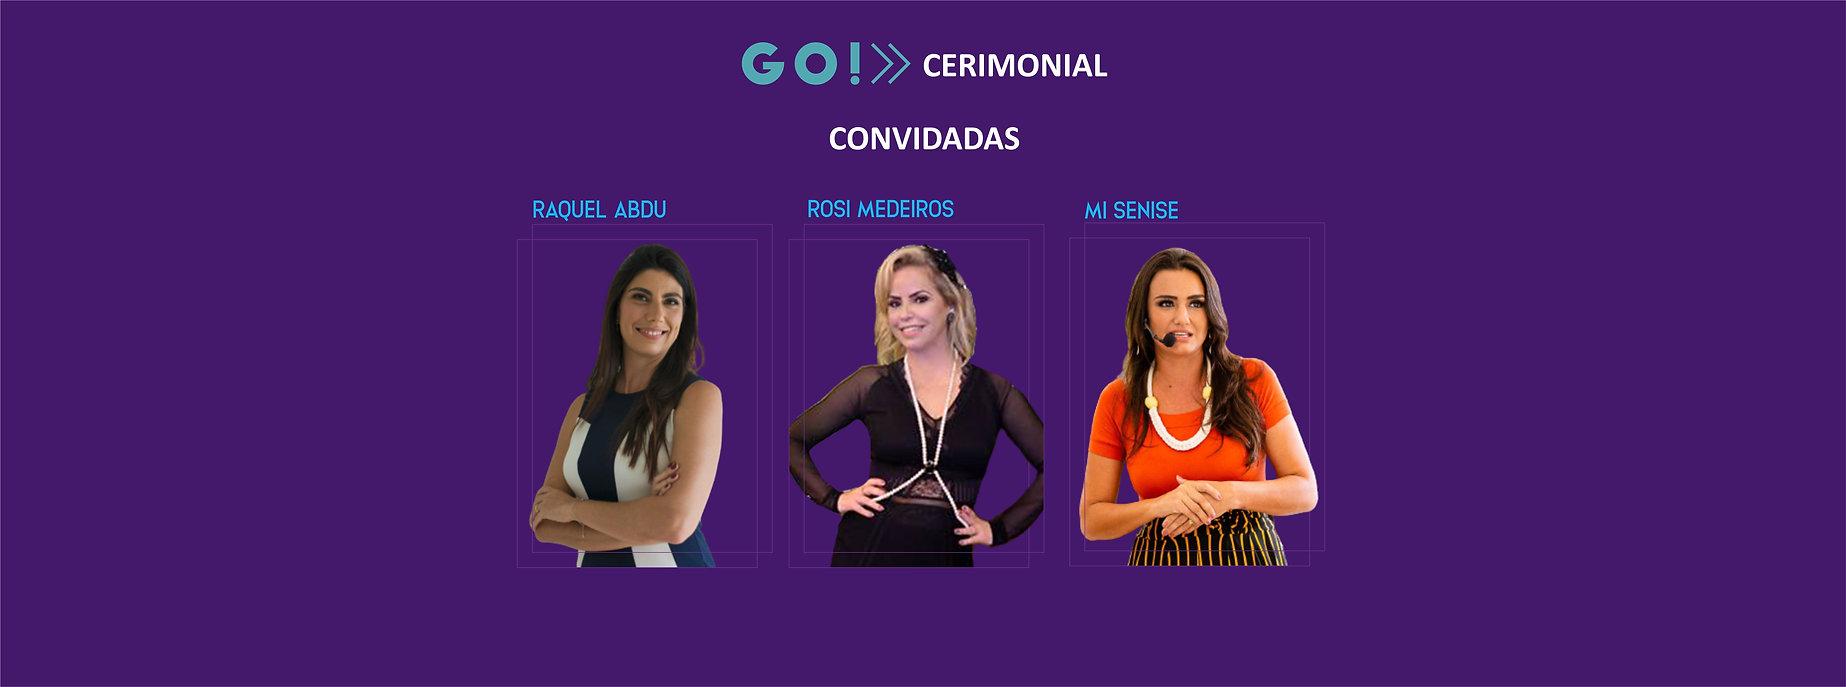 GO CERIMONIAL 2.jpg